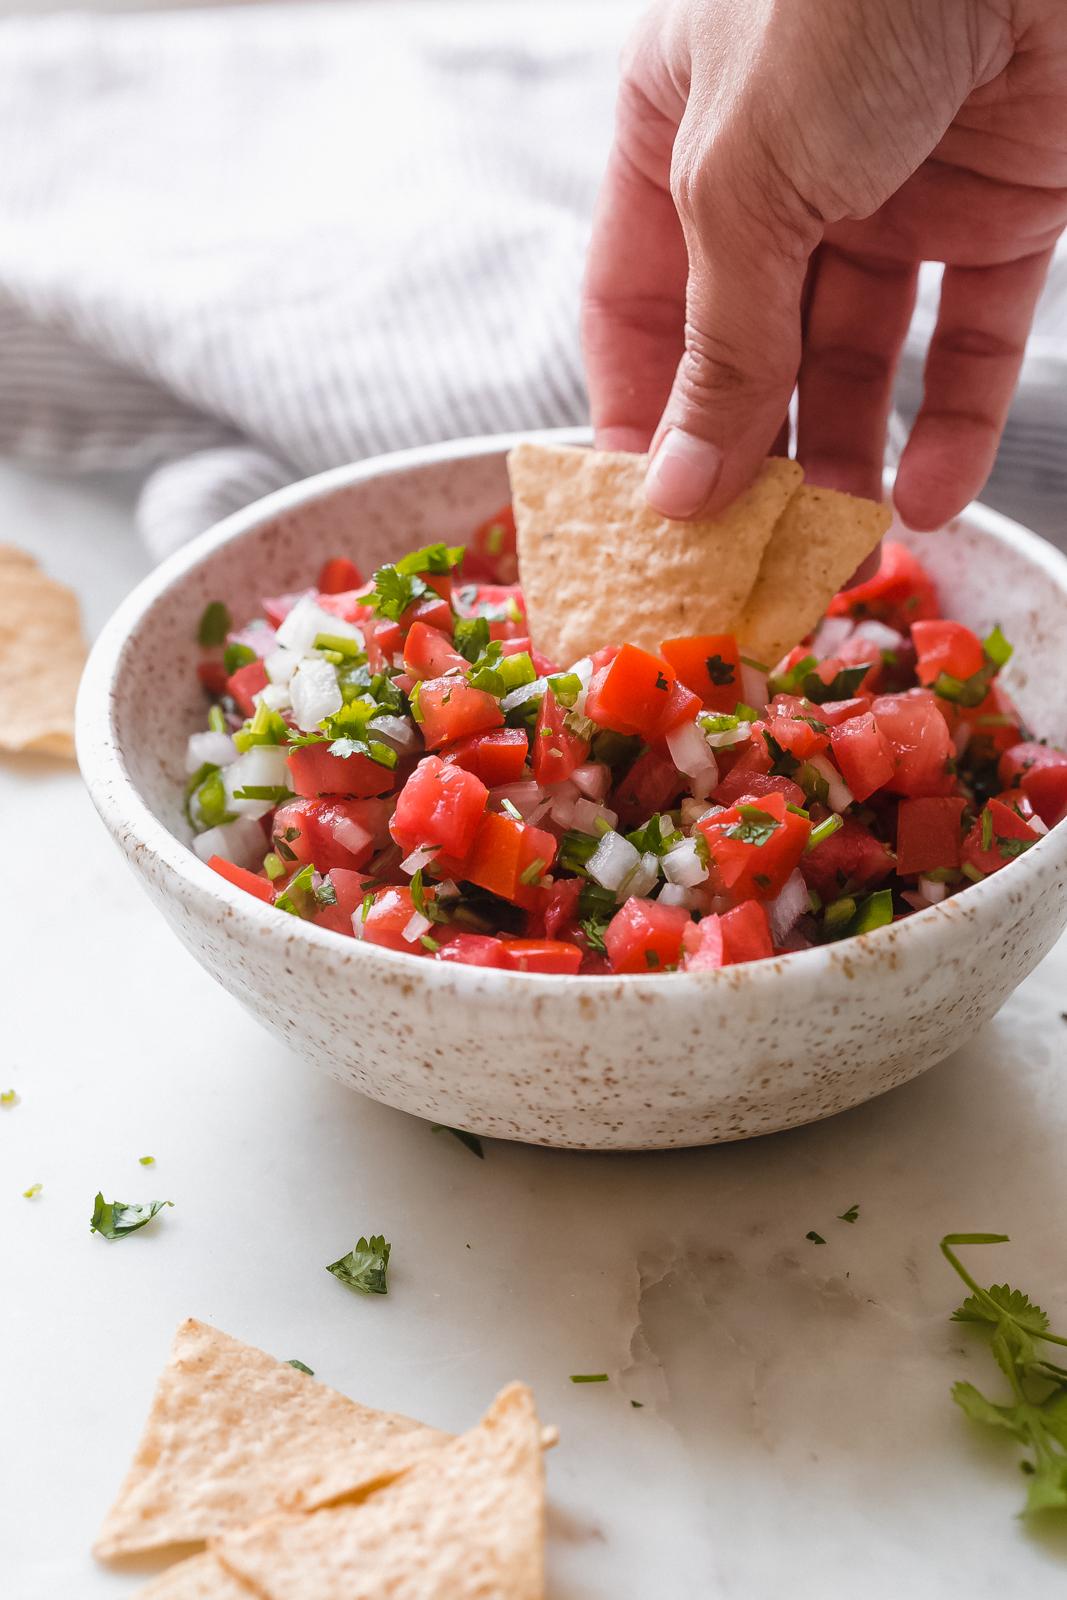 hand dipping tortilla chips into bowl with pico de gallo